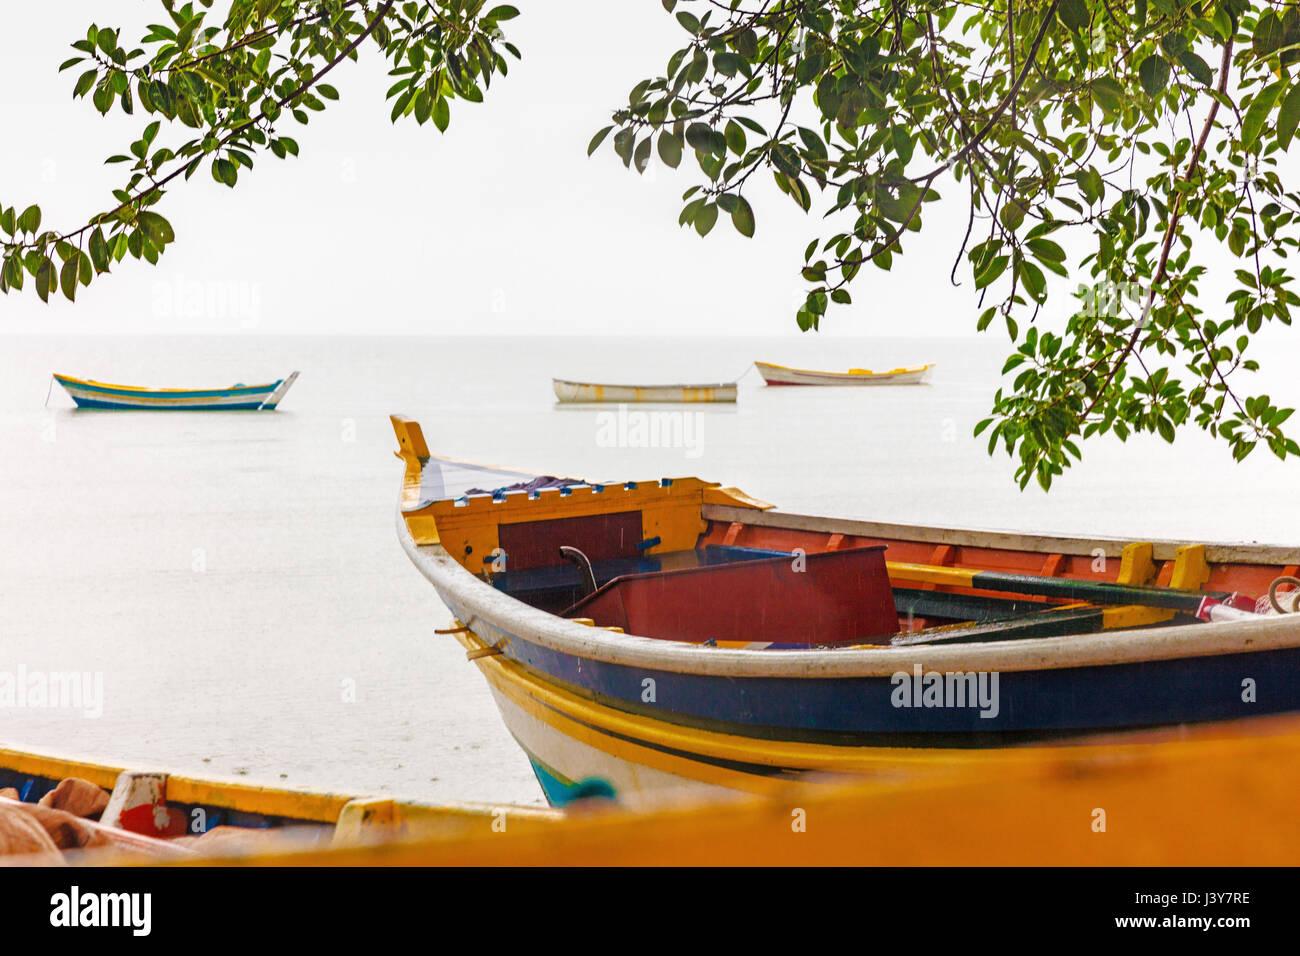 Colourful fishing boats be sea, Florianopolis, Santa Catarina, Brazil - Stock Image